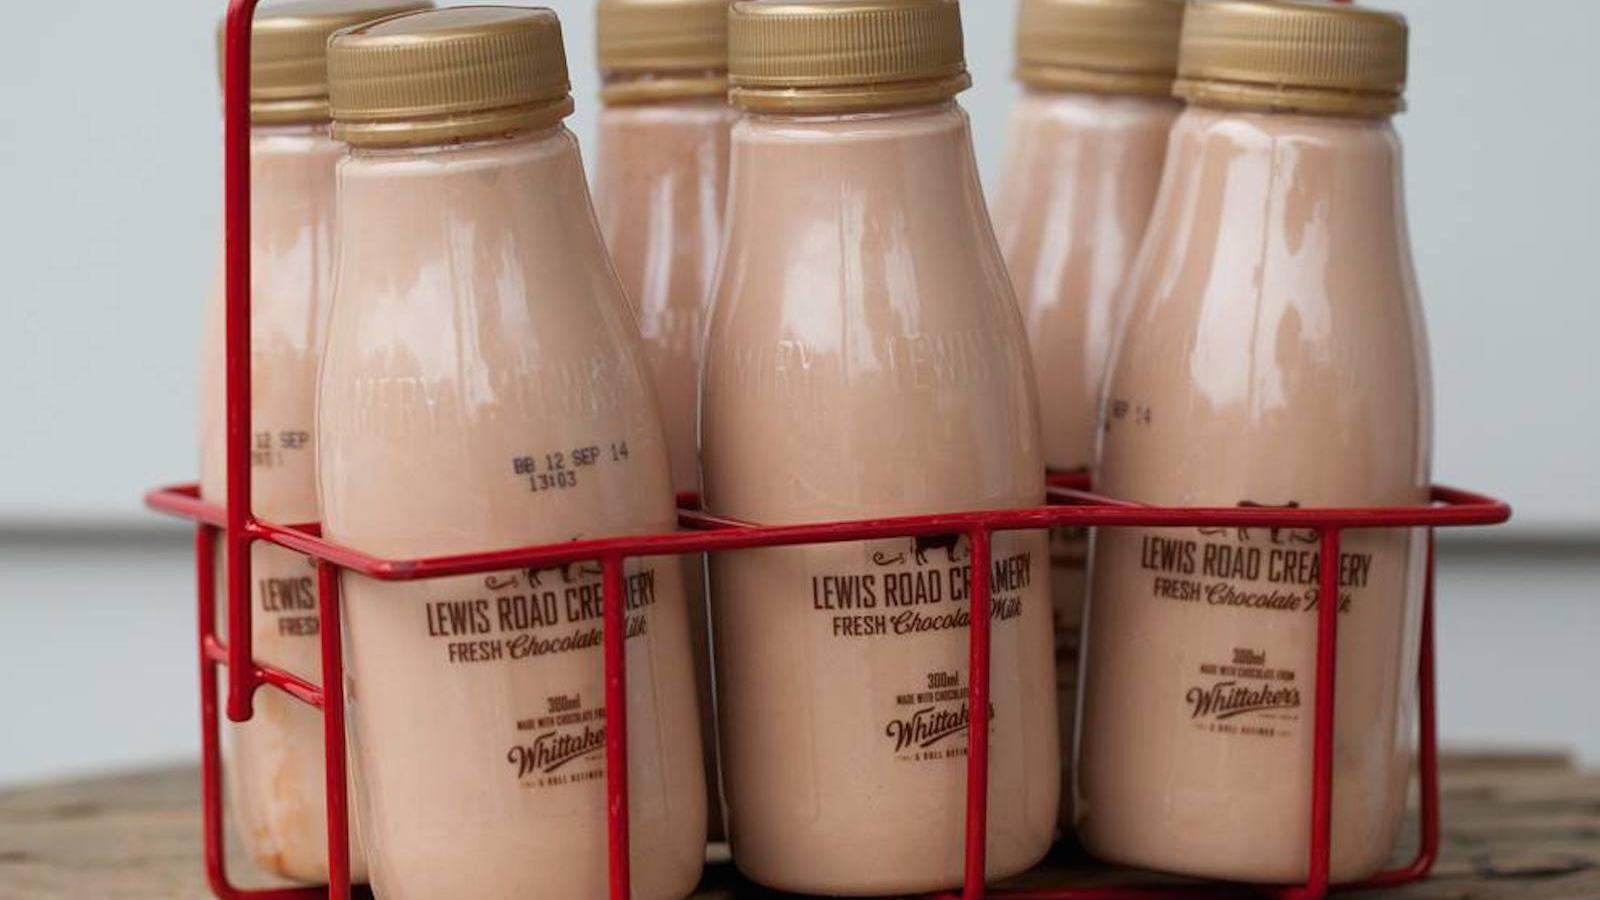 Lewis road cremery's chocolate milk source: qz.com